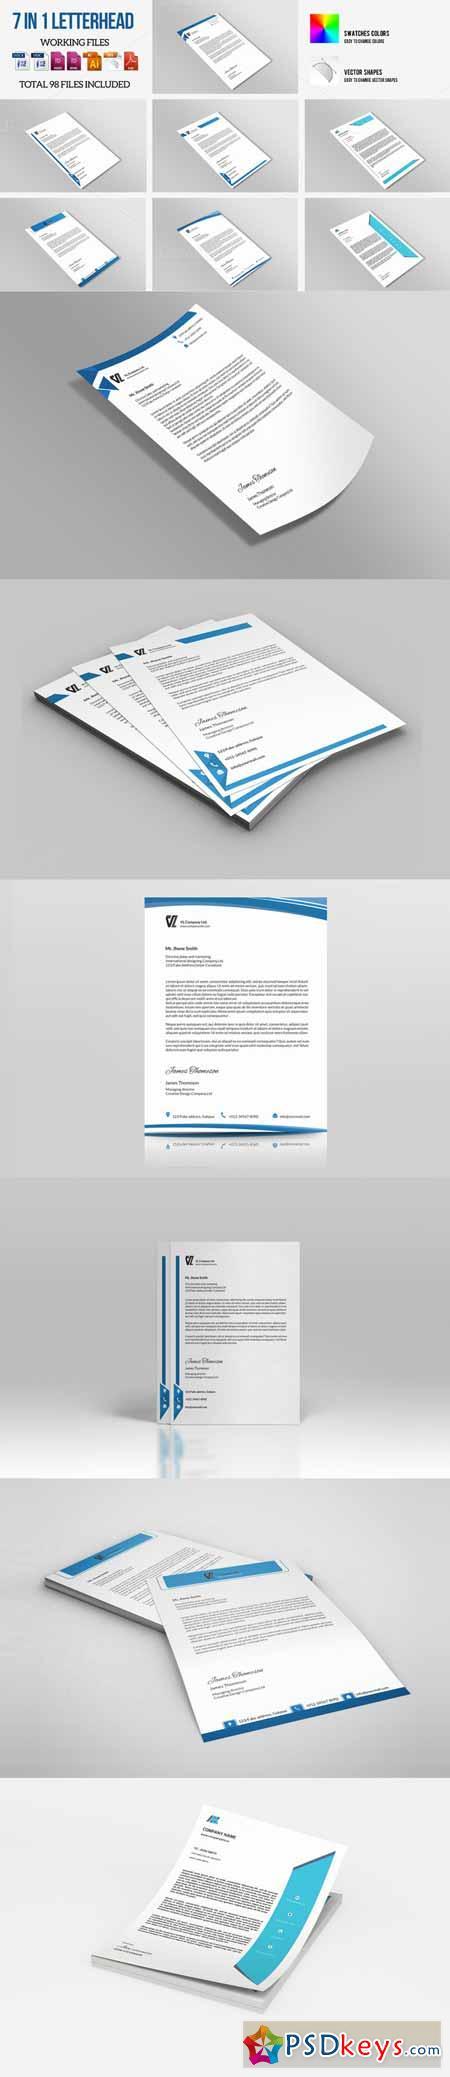 Corporate Letterhead 7 in 1 366817